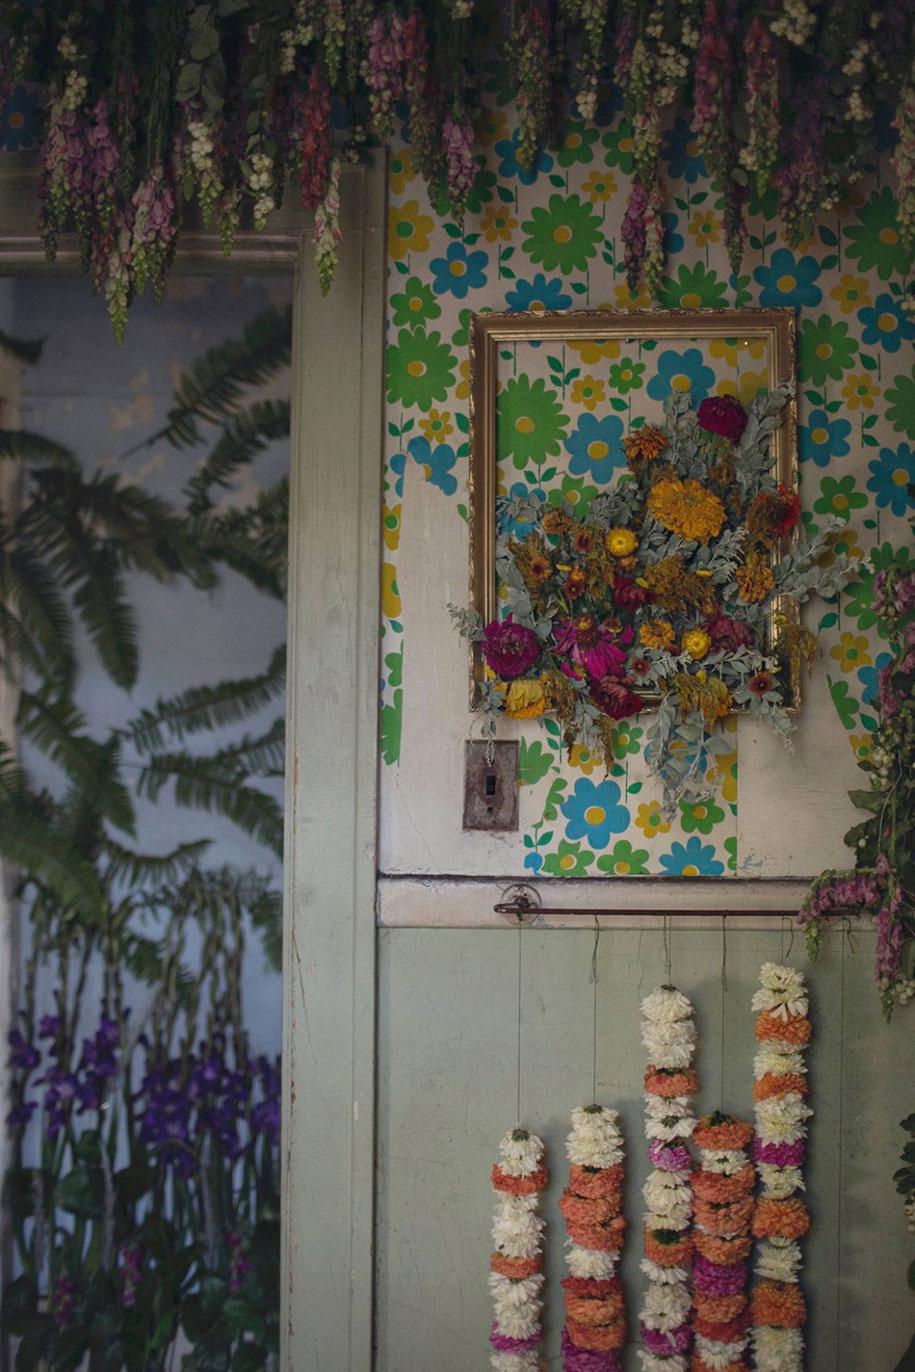 abandoned-house-transformed-flower-house-lisa-waud-heather-saunders-25